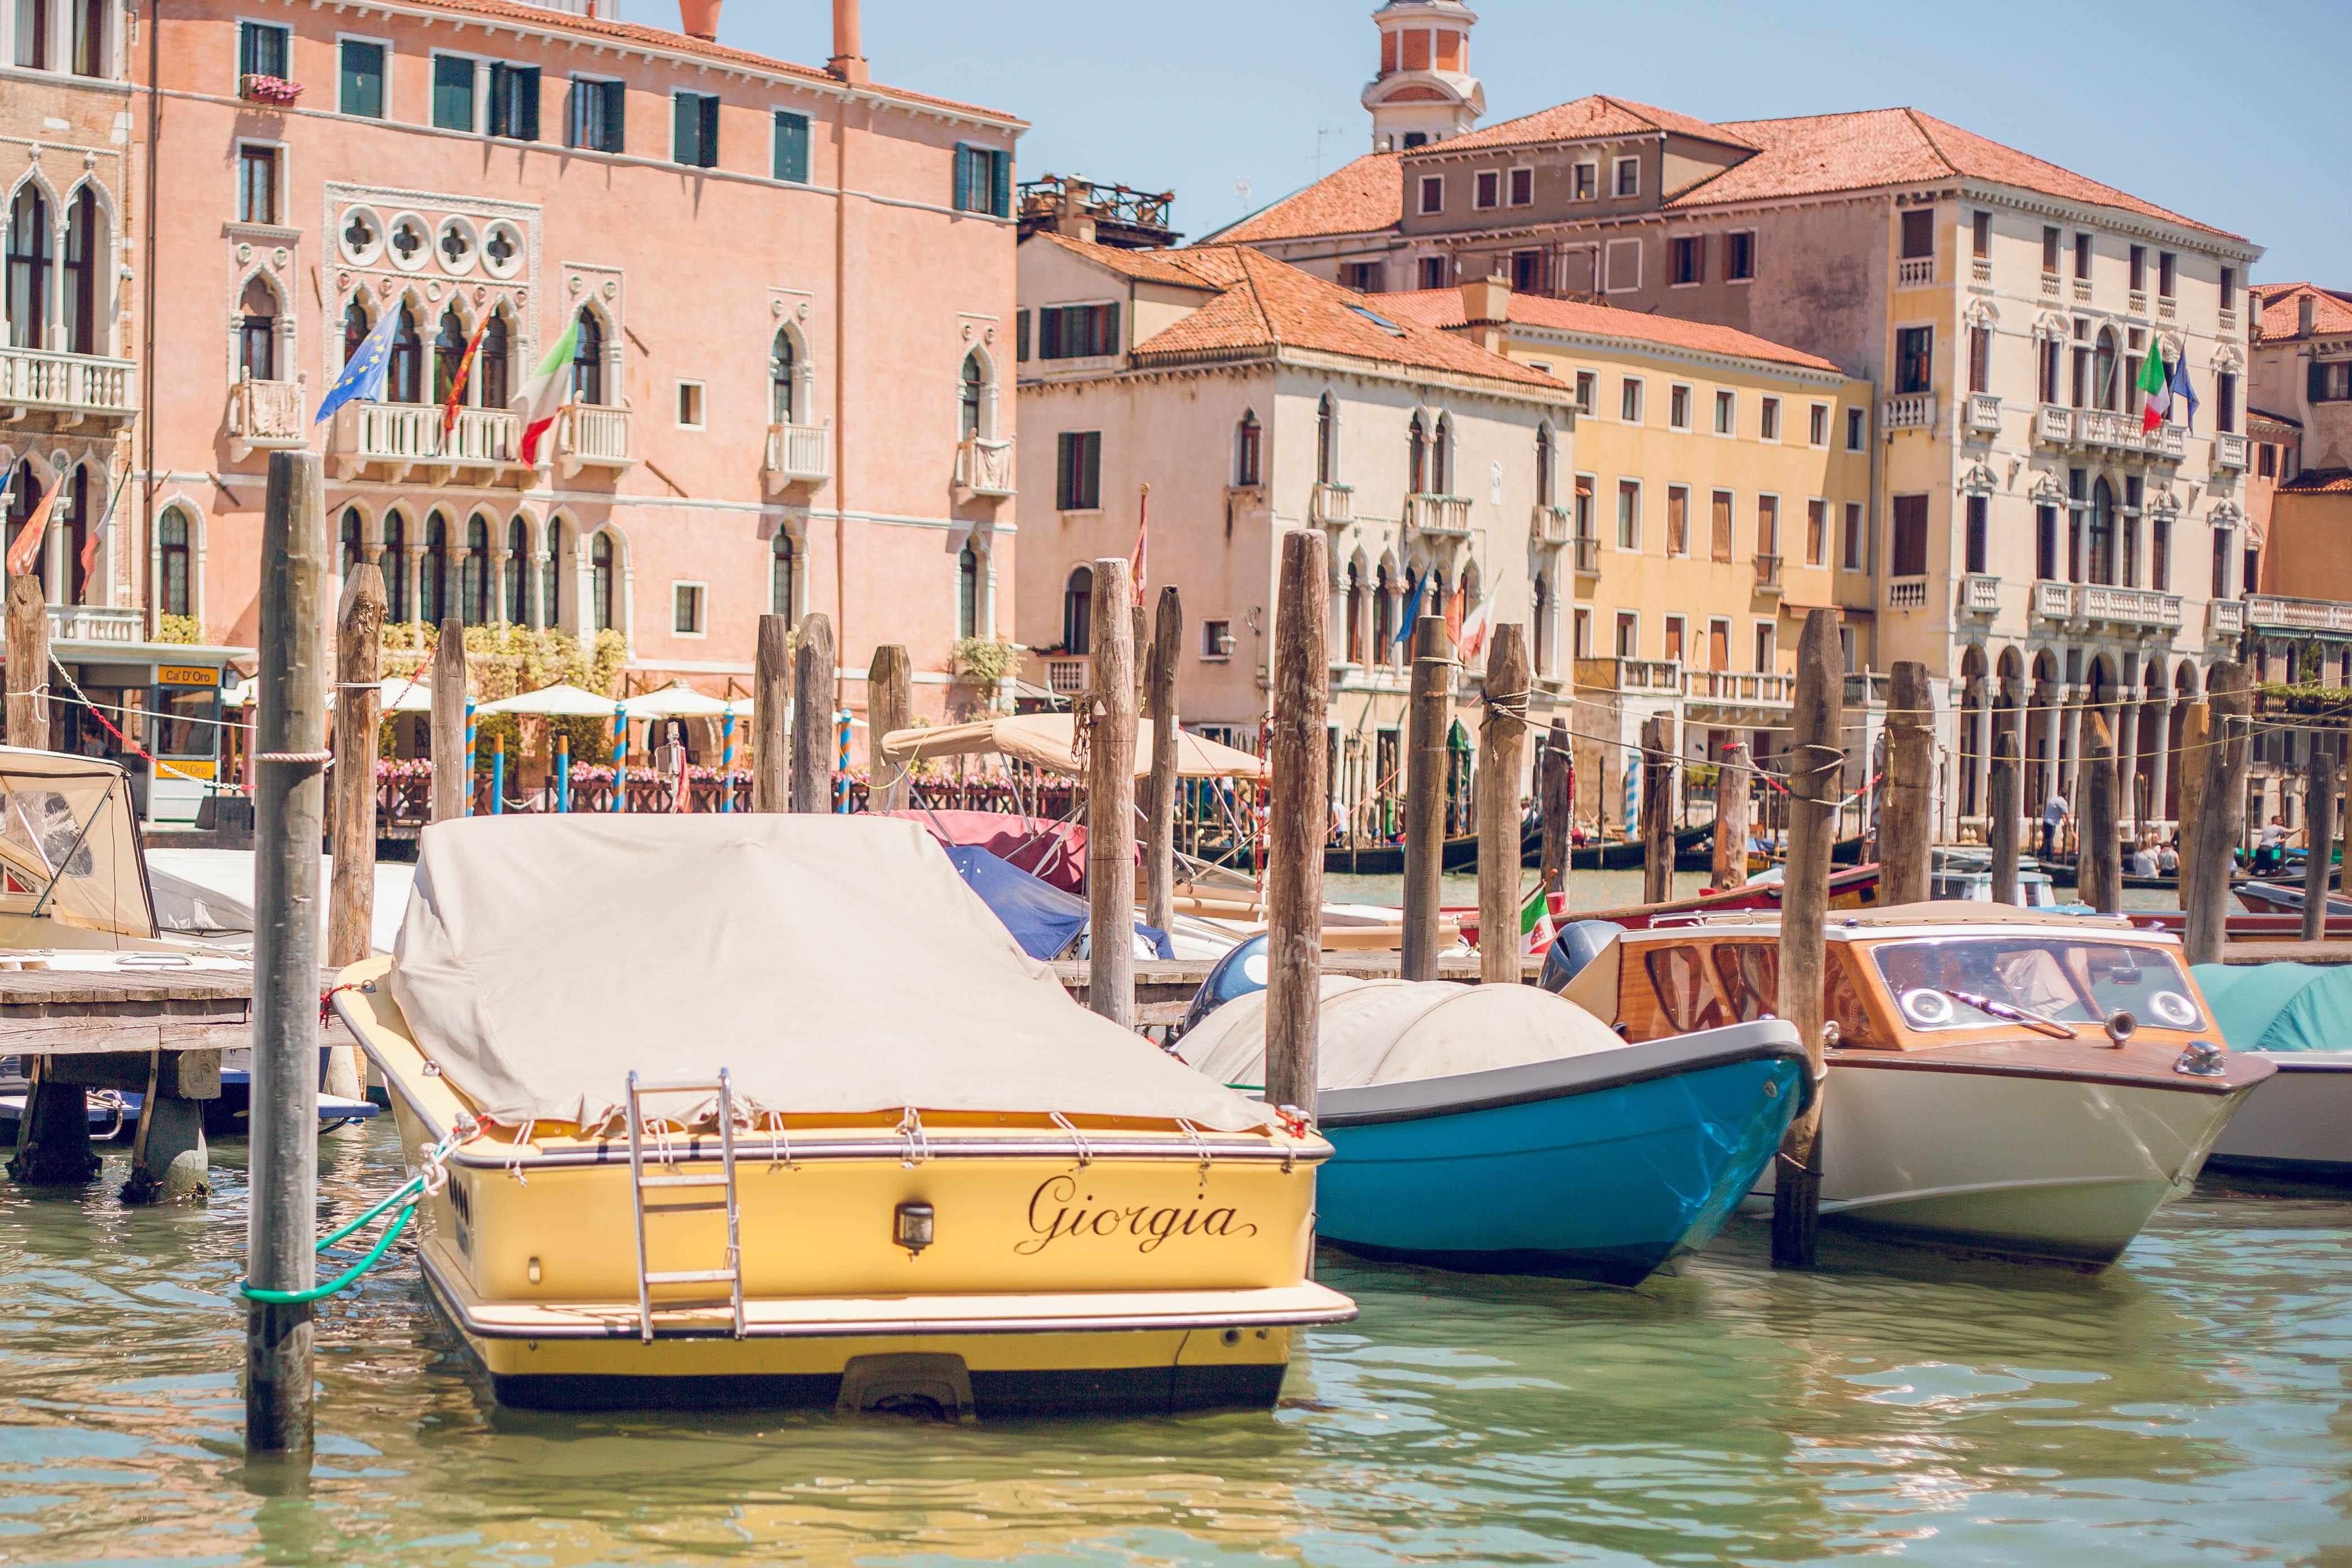 Lost and Found in Venice